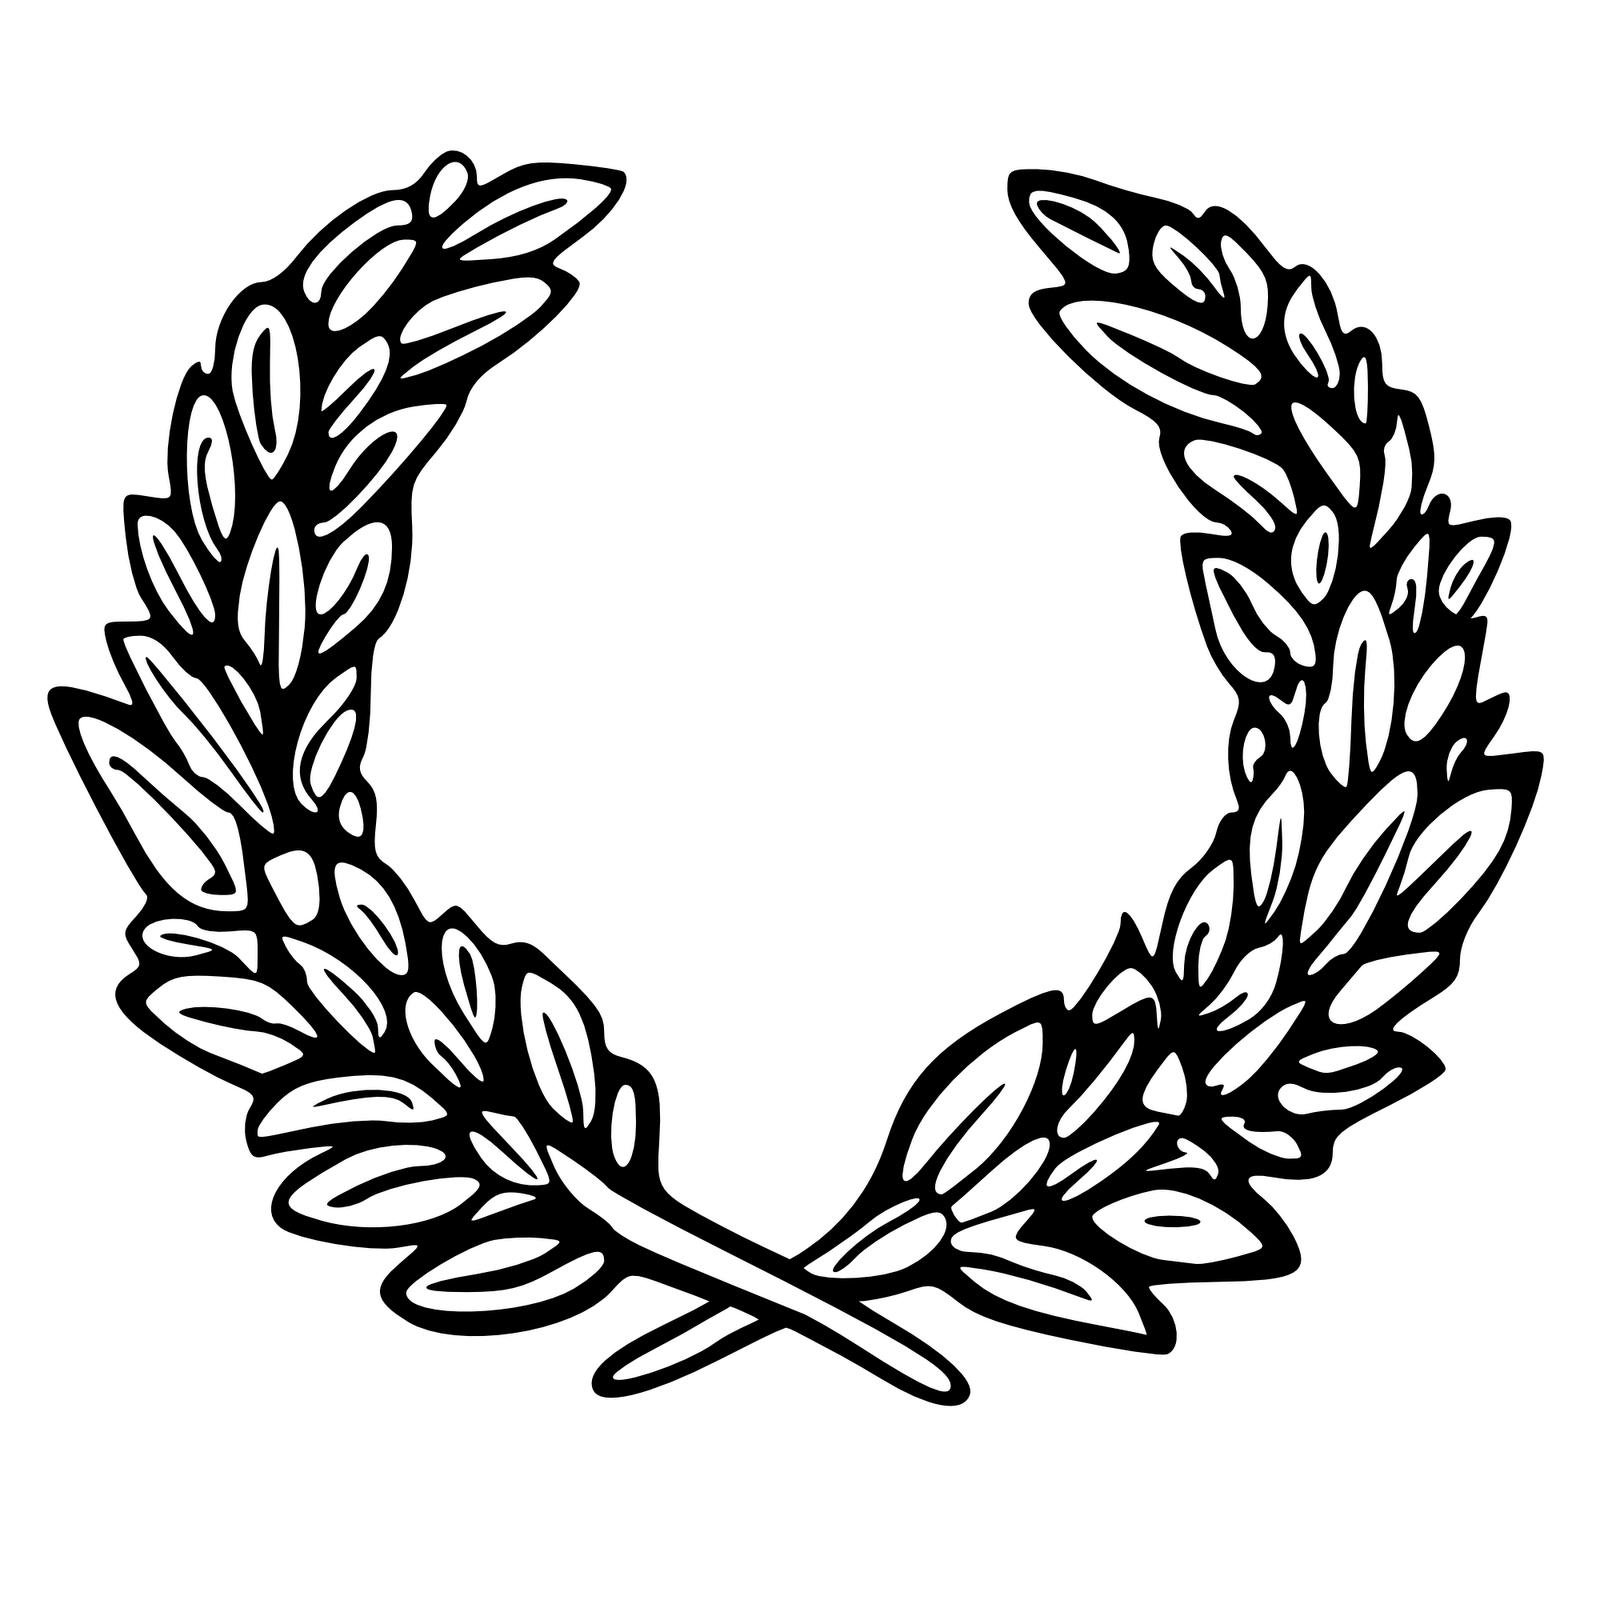 Greek Wreath Clipart Best Greek Wreath Laurel Wreath Tattoo Wreath Tattoo